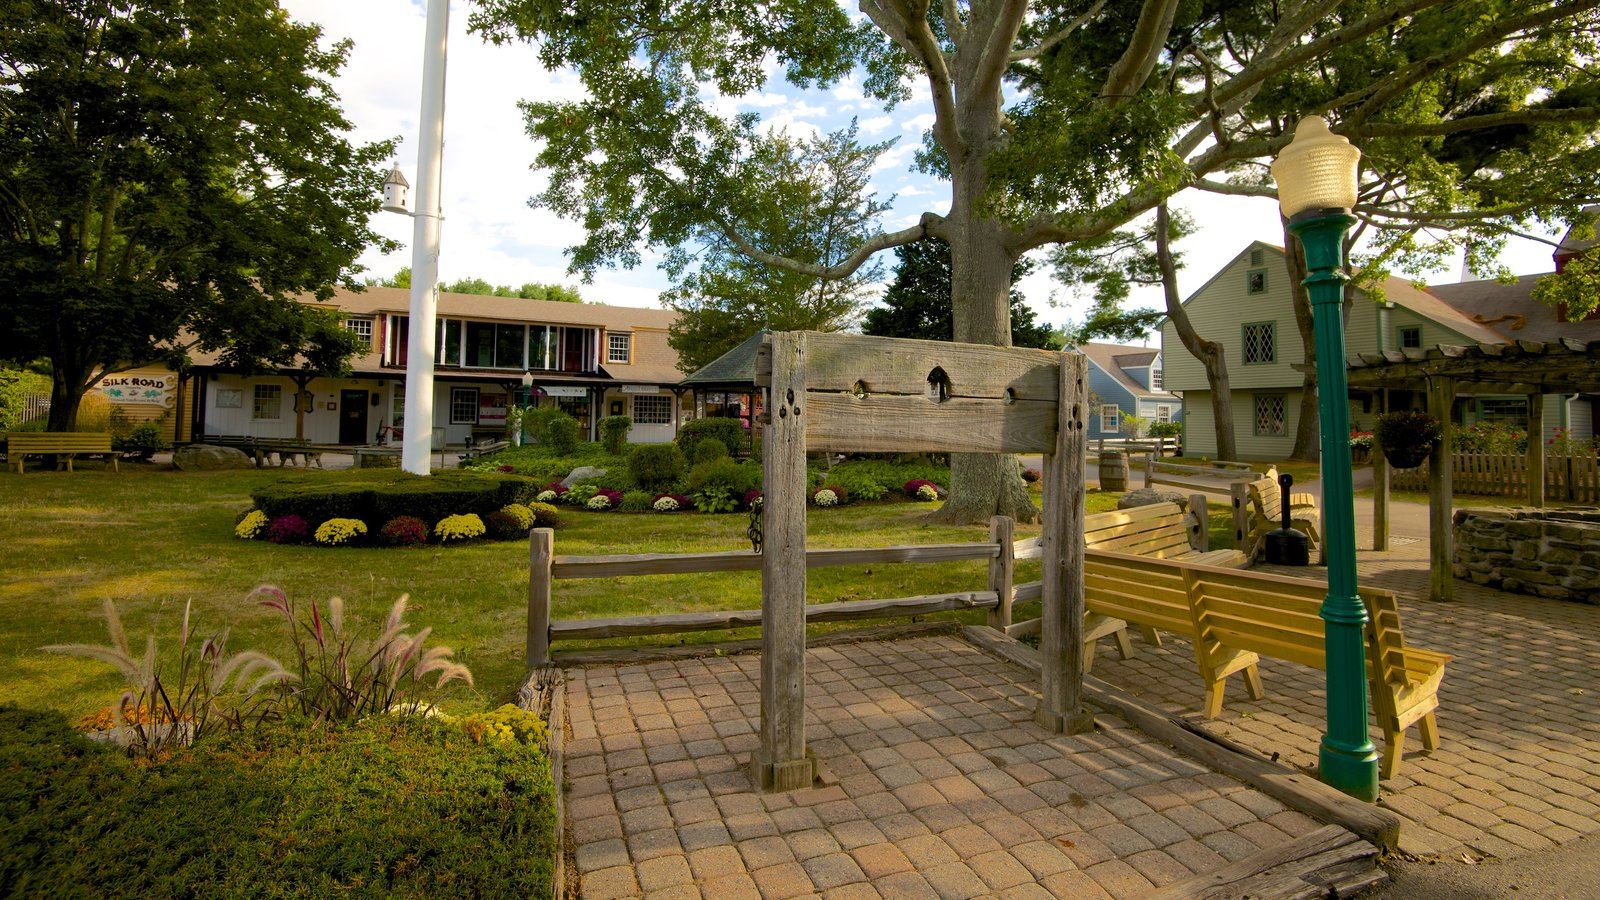 Gardens & Parks Pictures: View Images of Olde Mistick Village